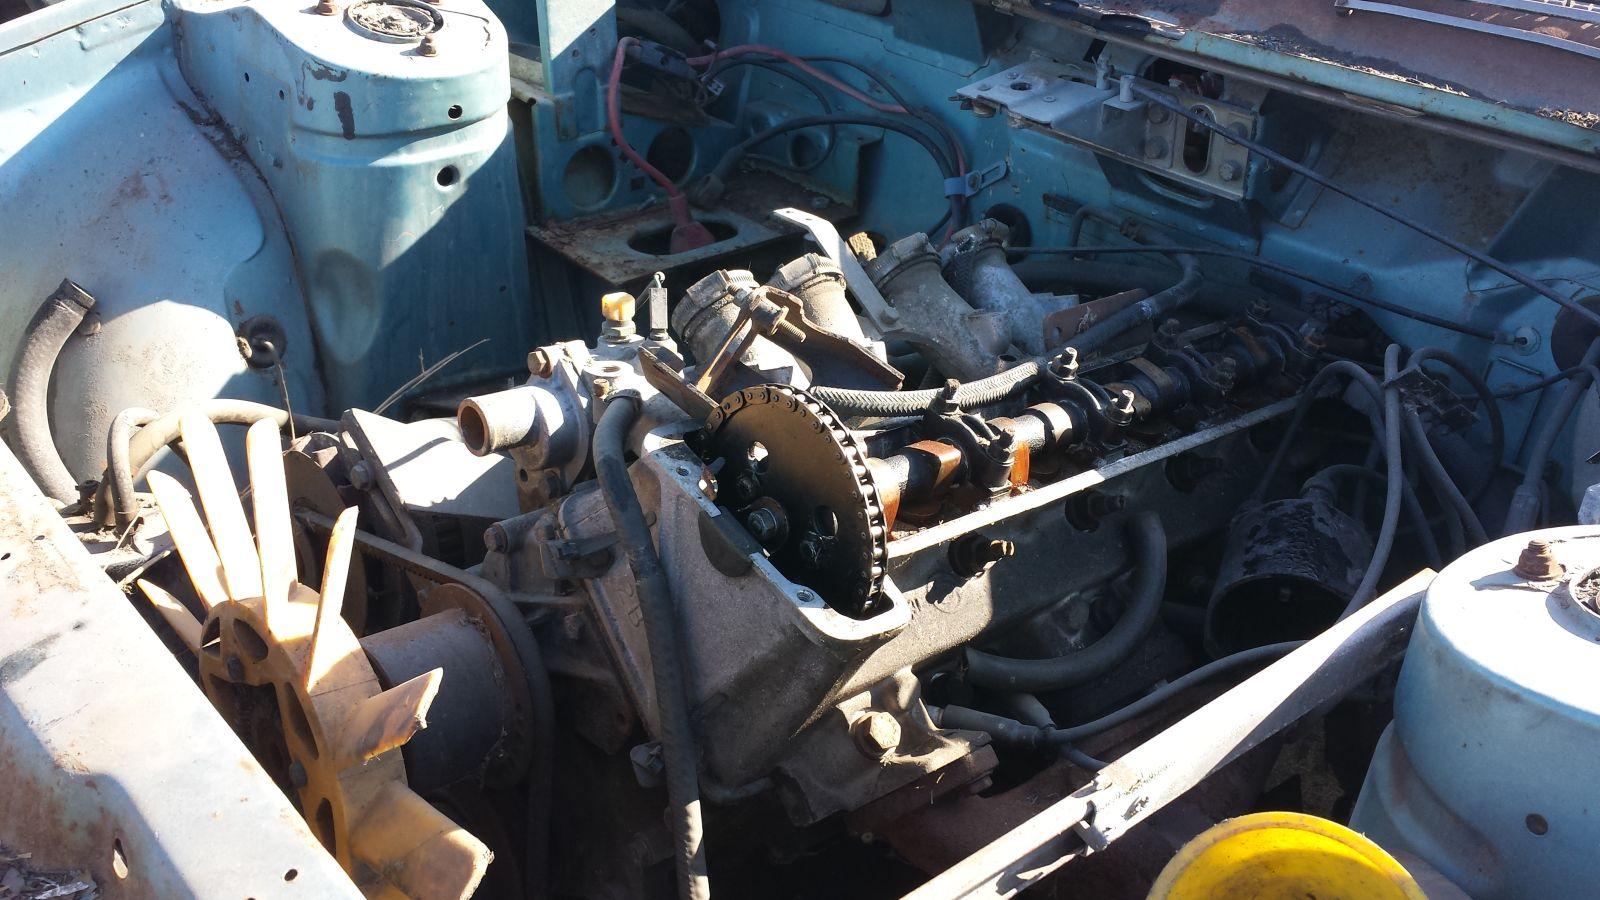 1980 Triumph TR7 in California self-service wrecking yard